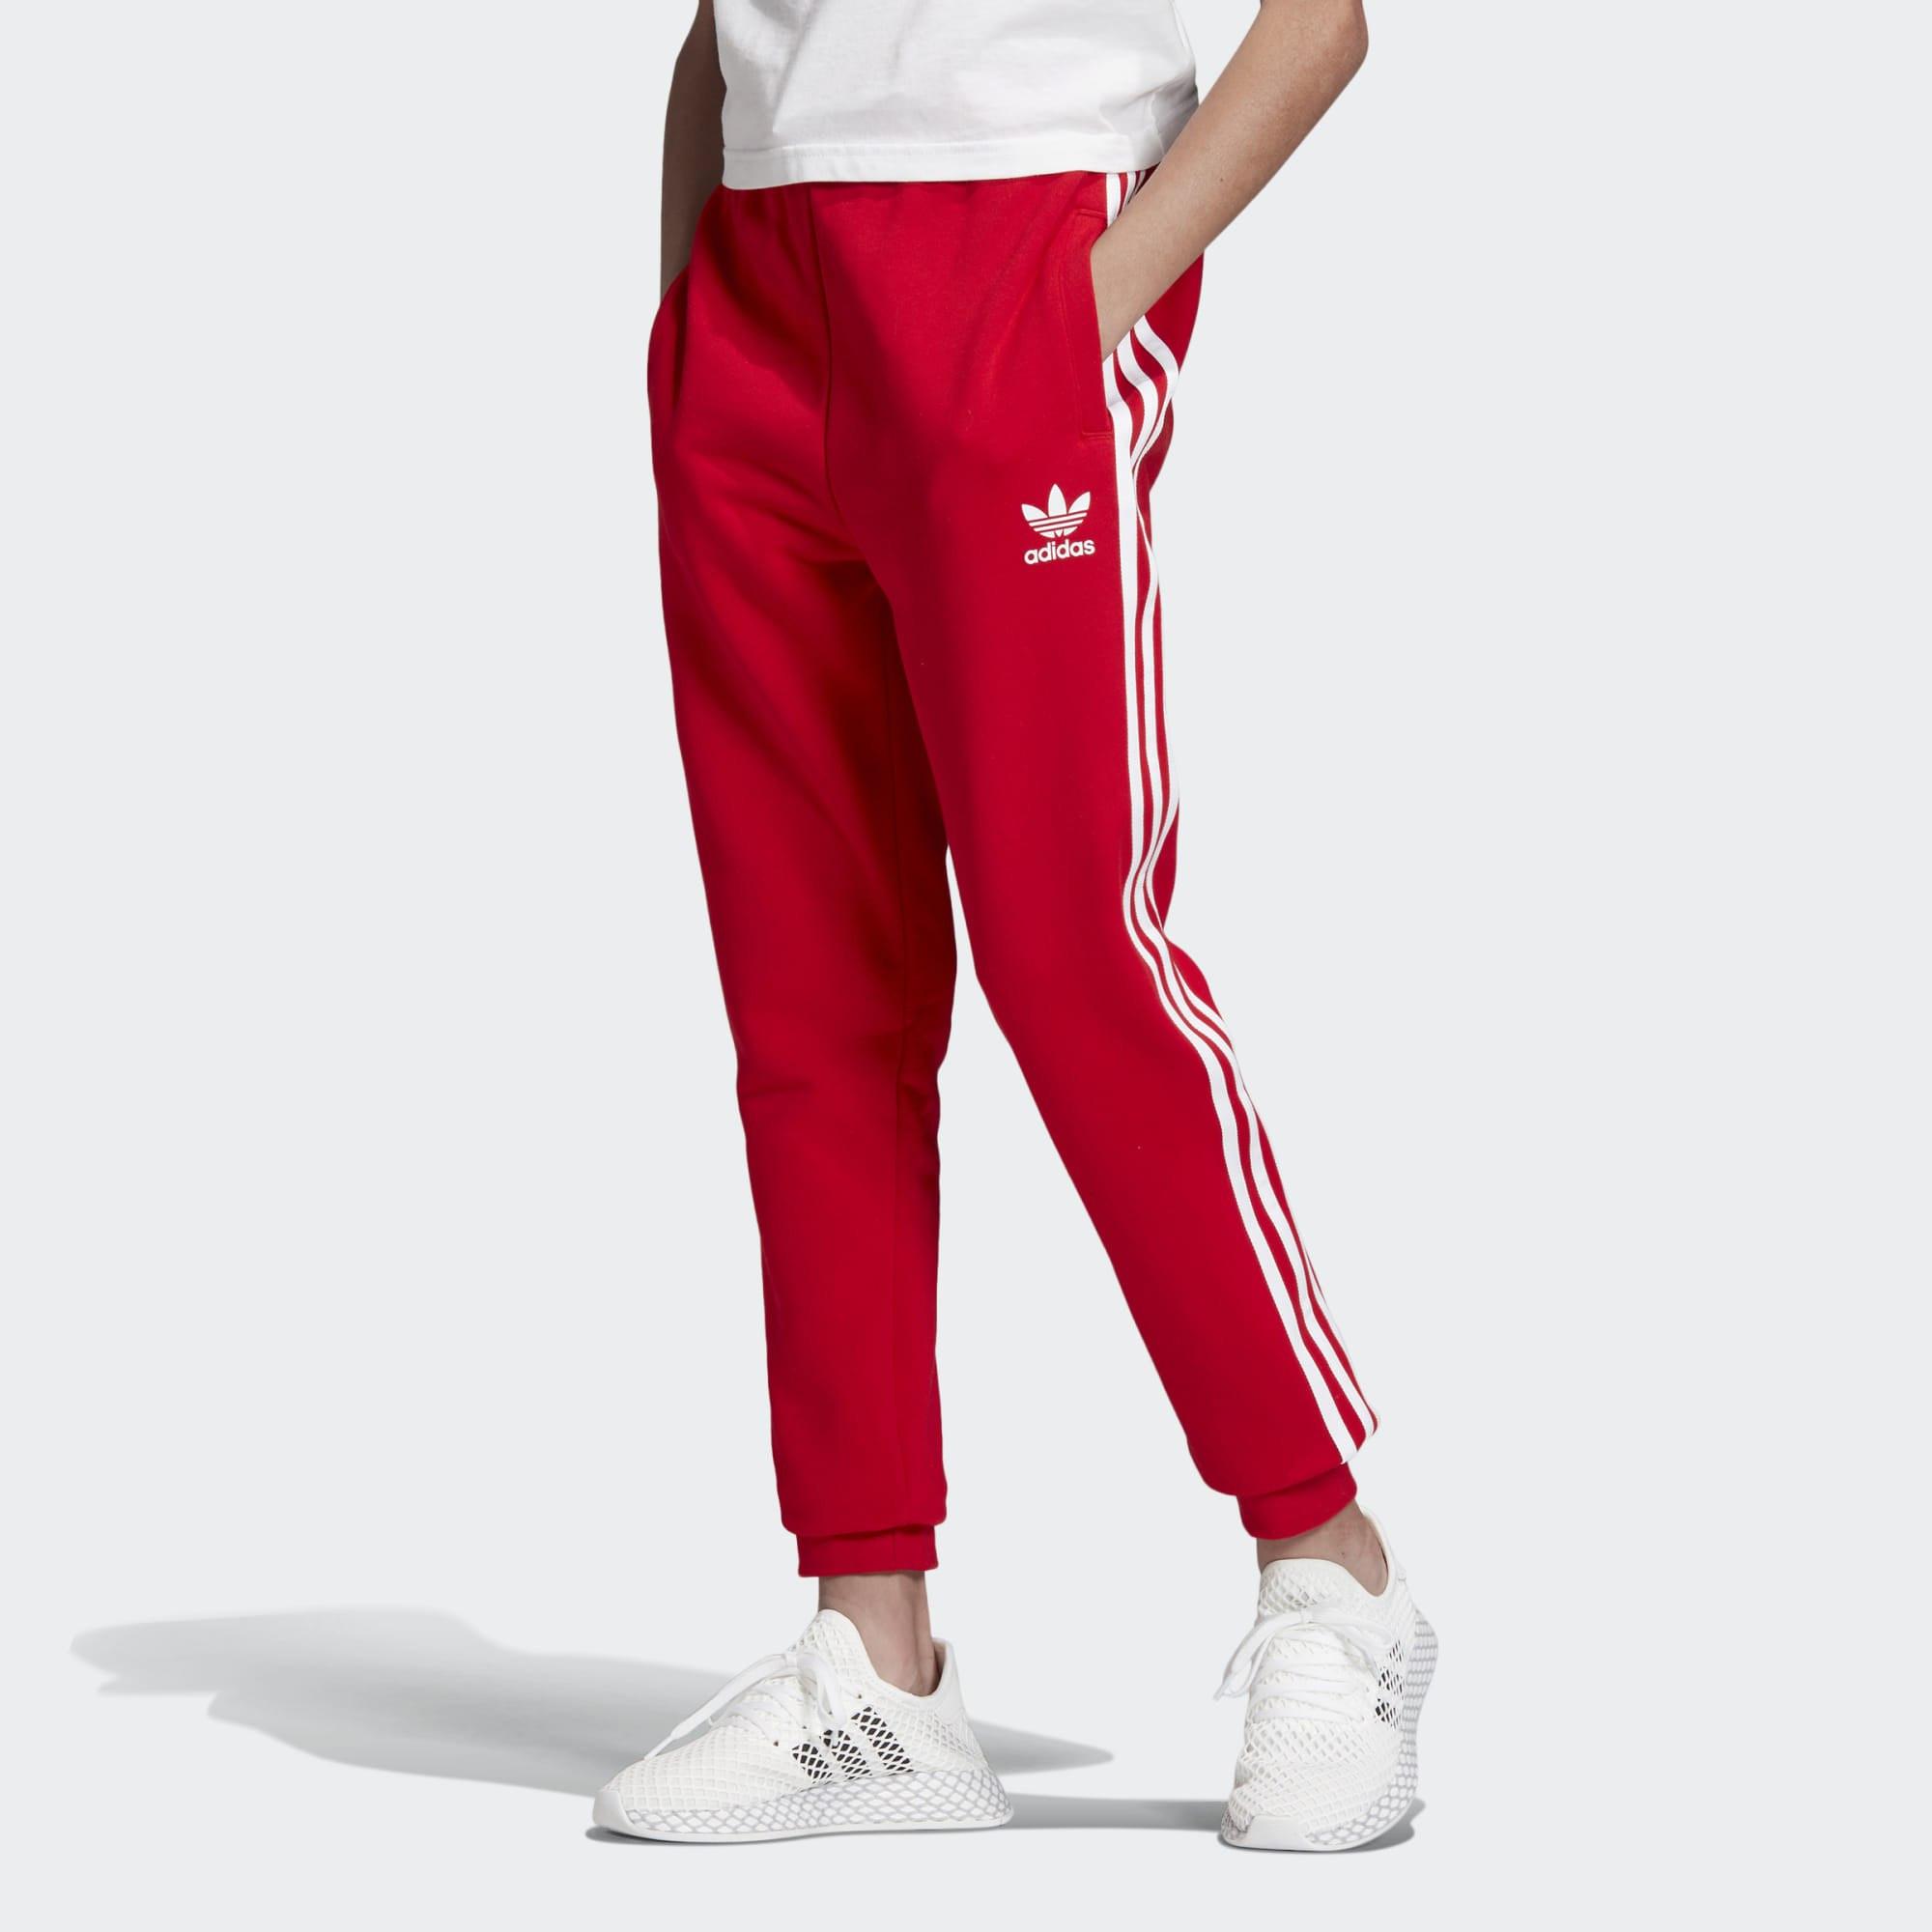 adidas Originals TREFOIL PANTS (9000031721_7838)